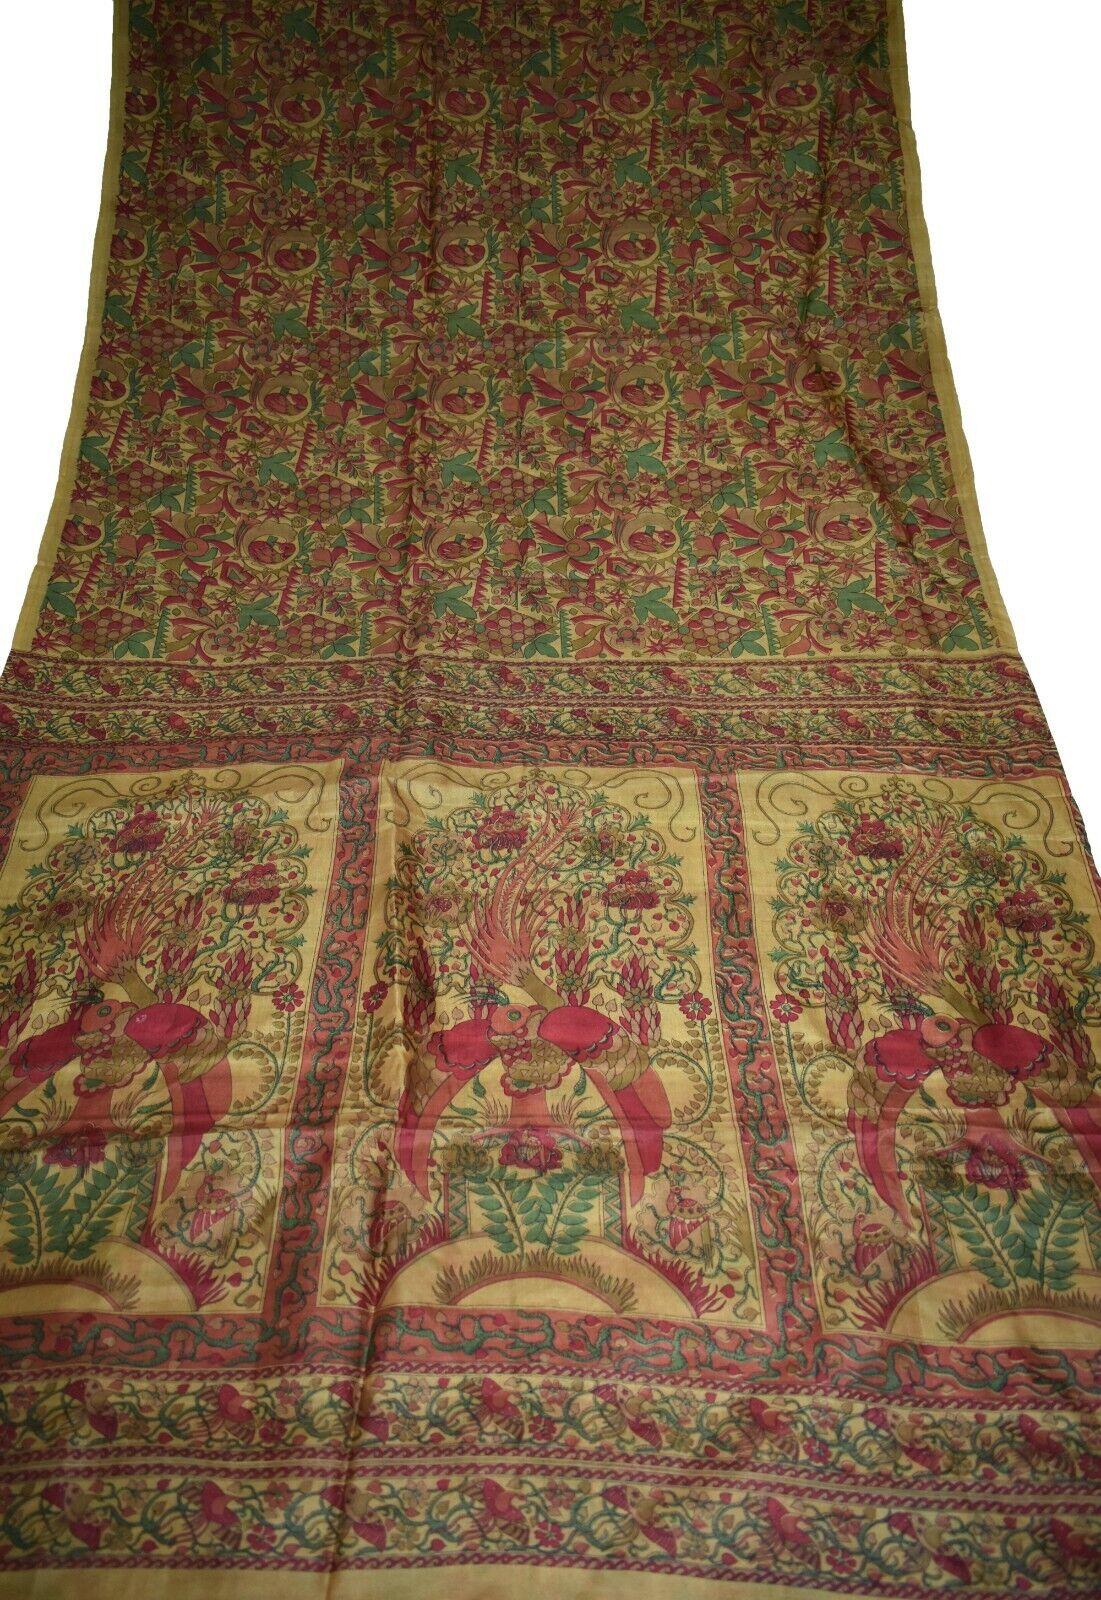 Vintage Printed Saree Brown Pure Silk Floral Print Sari Design Craft PR-6670